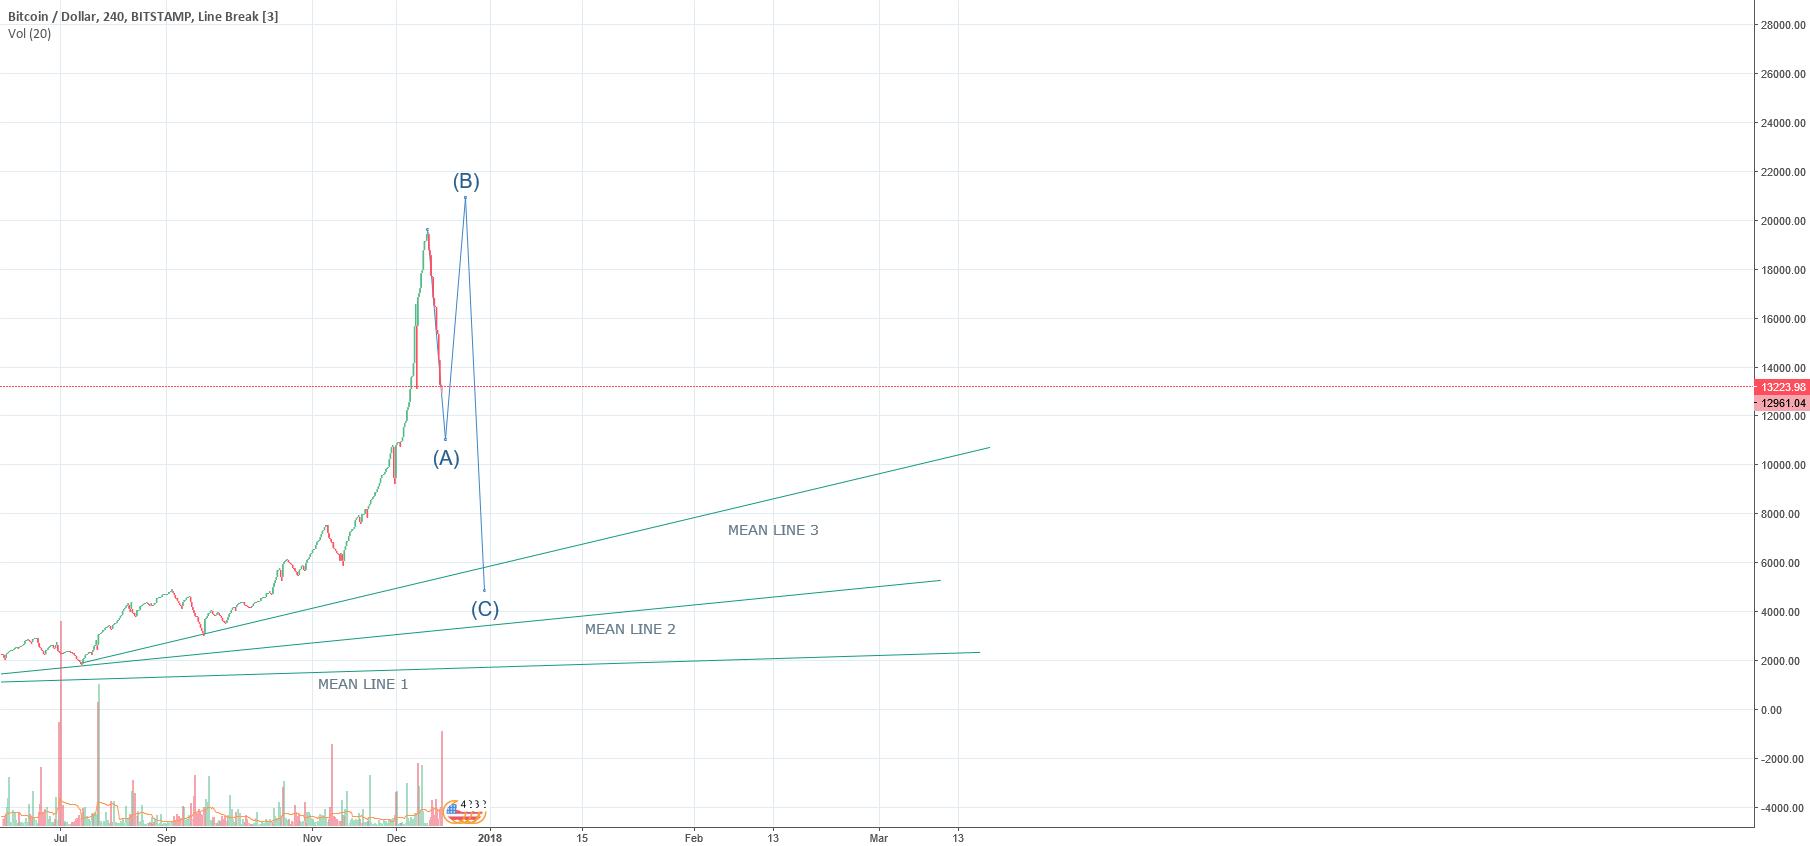 Market reset scenario #2